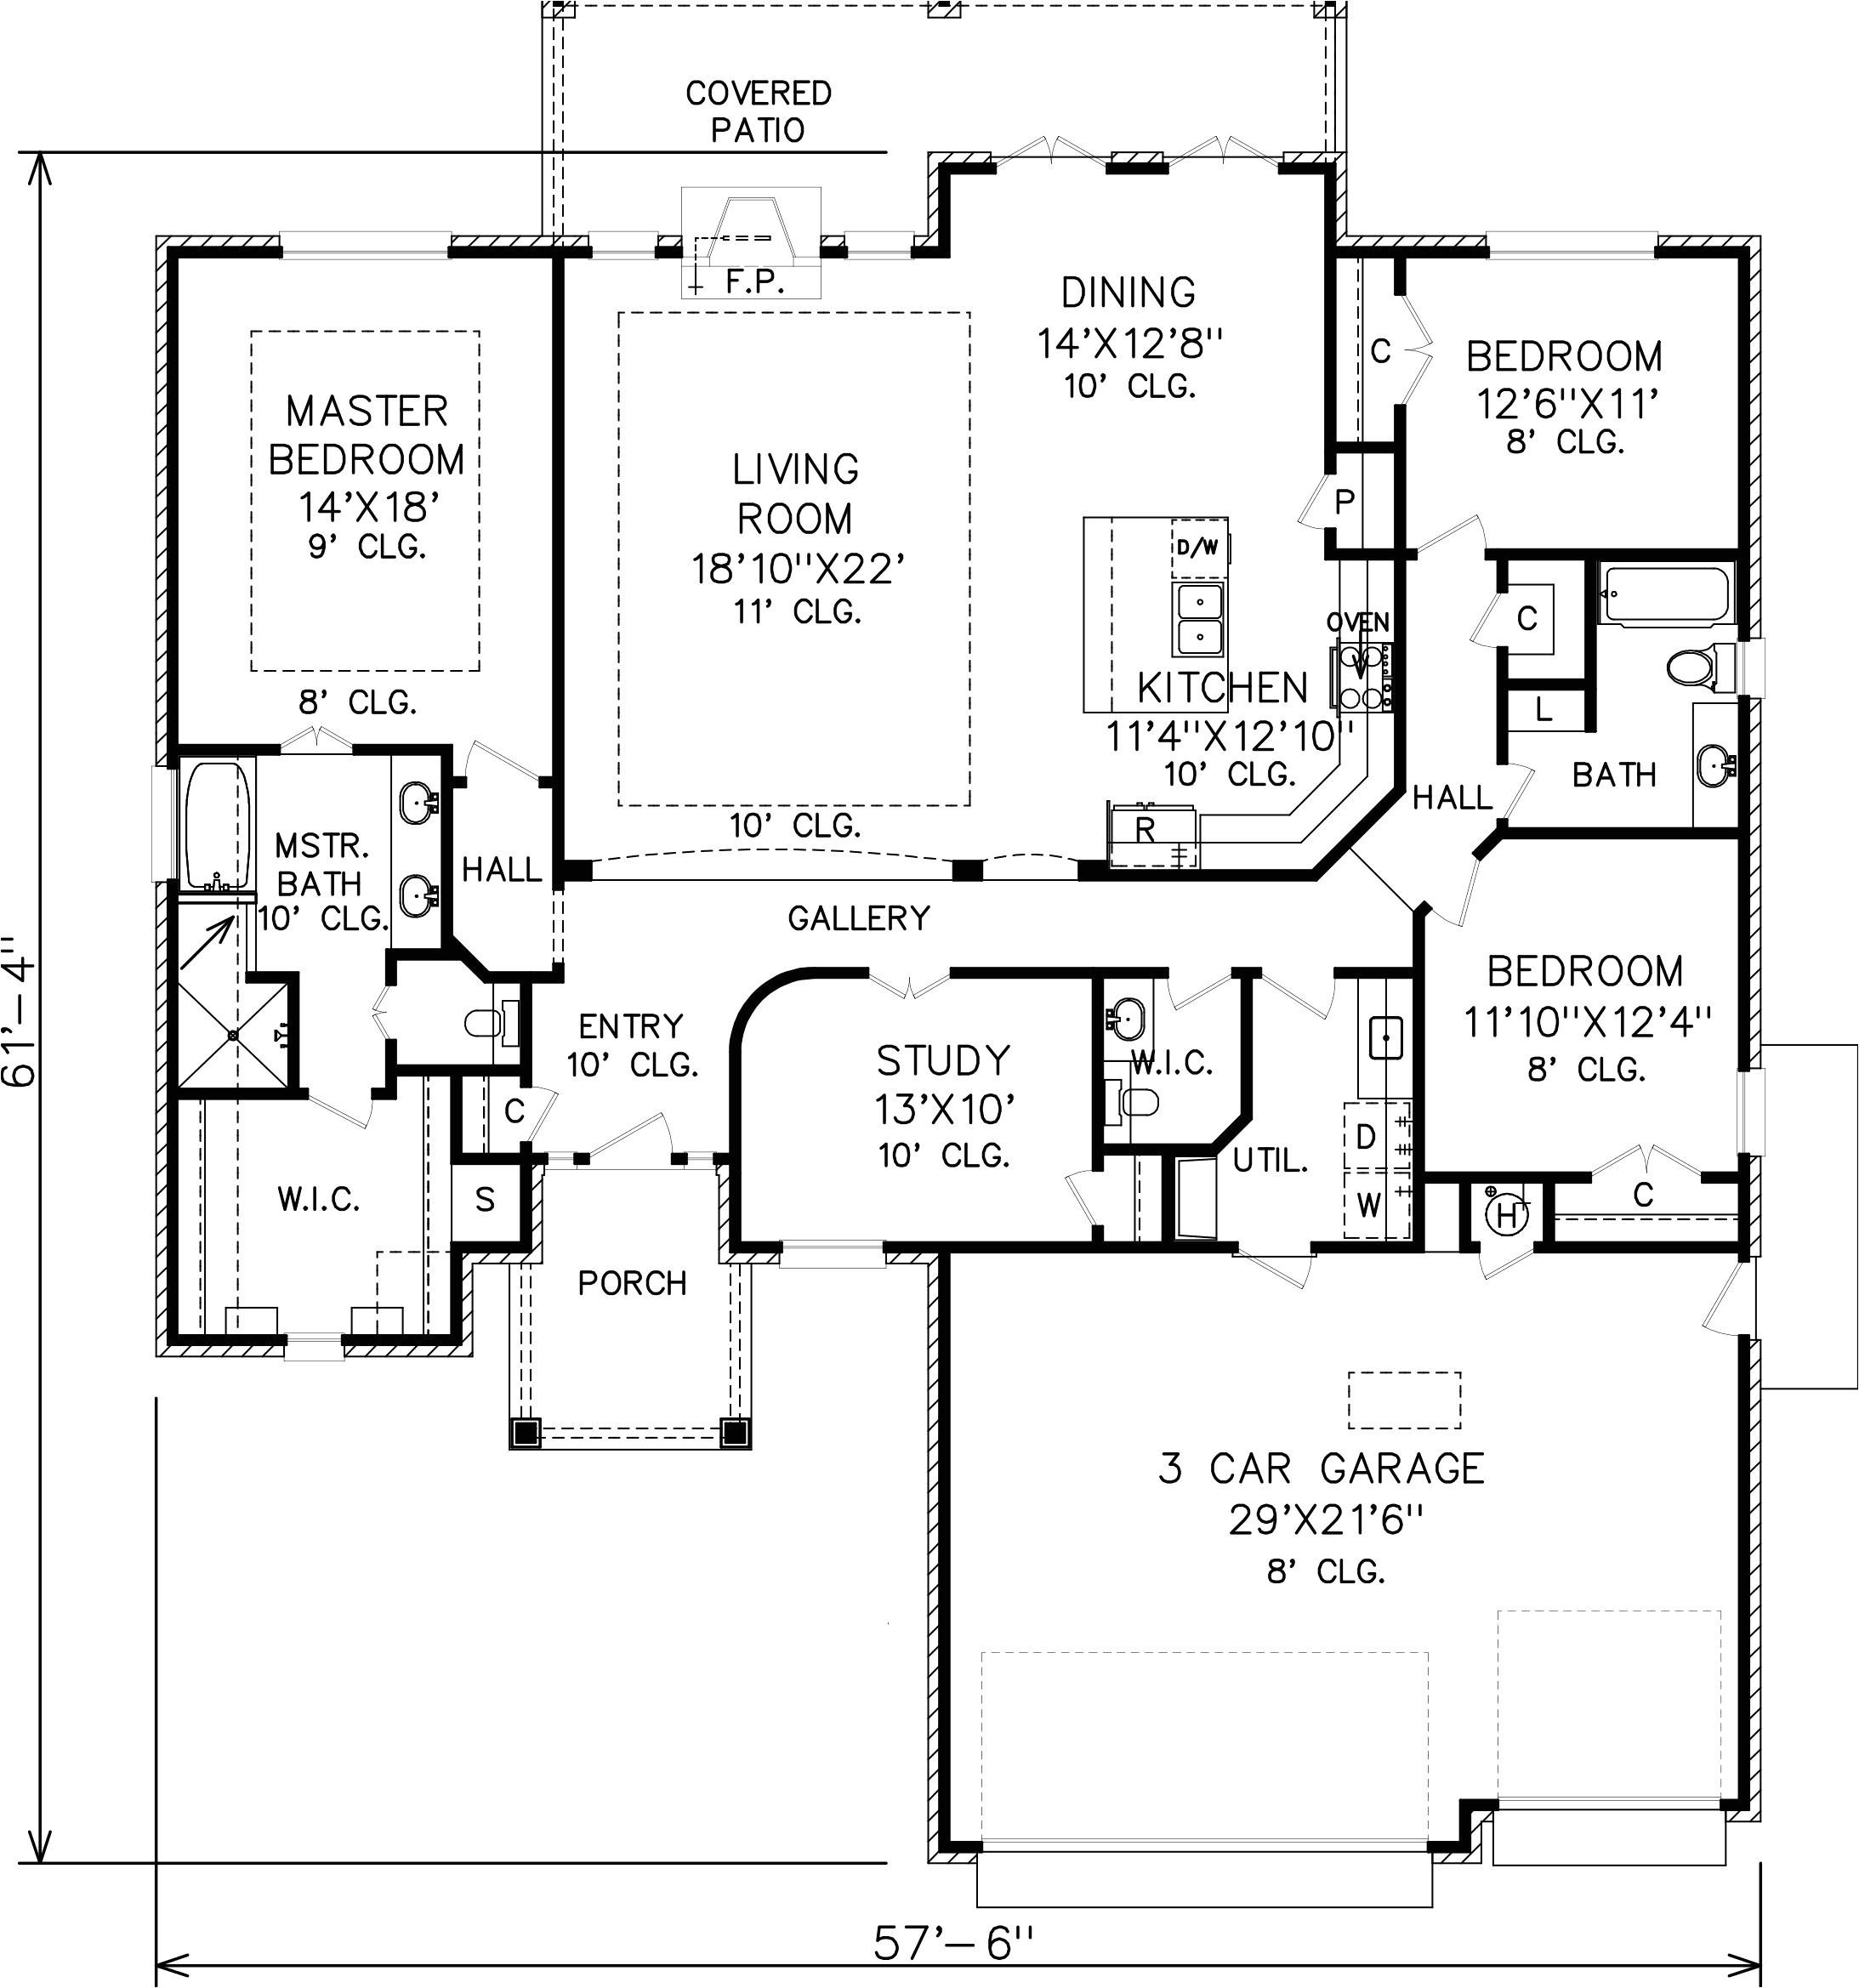 telus internet plans home luxury home internet no contract plans beautiful home service plans